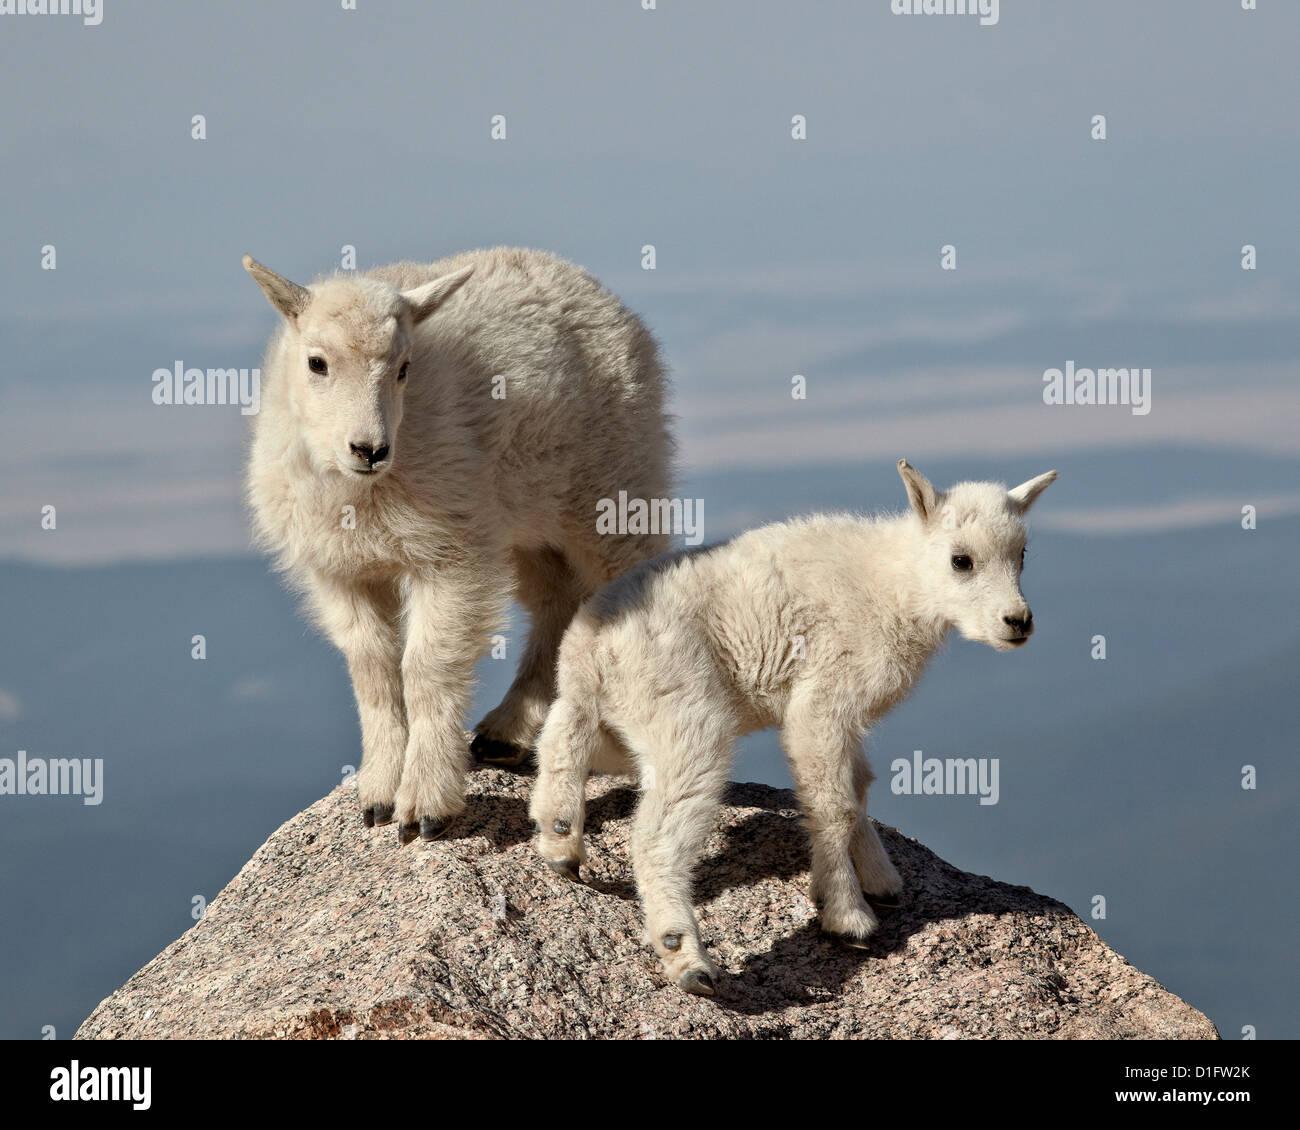 Mountain goat (Oreamnos americanus) kids, Mount Evans, Arapaho-Roosevelt National Forest, Colorado, United States - Stock Image